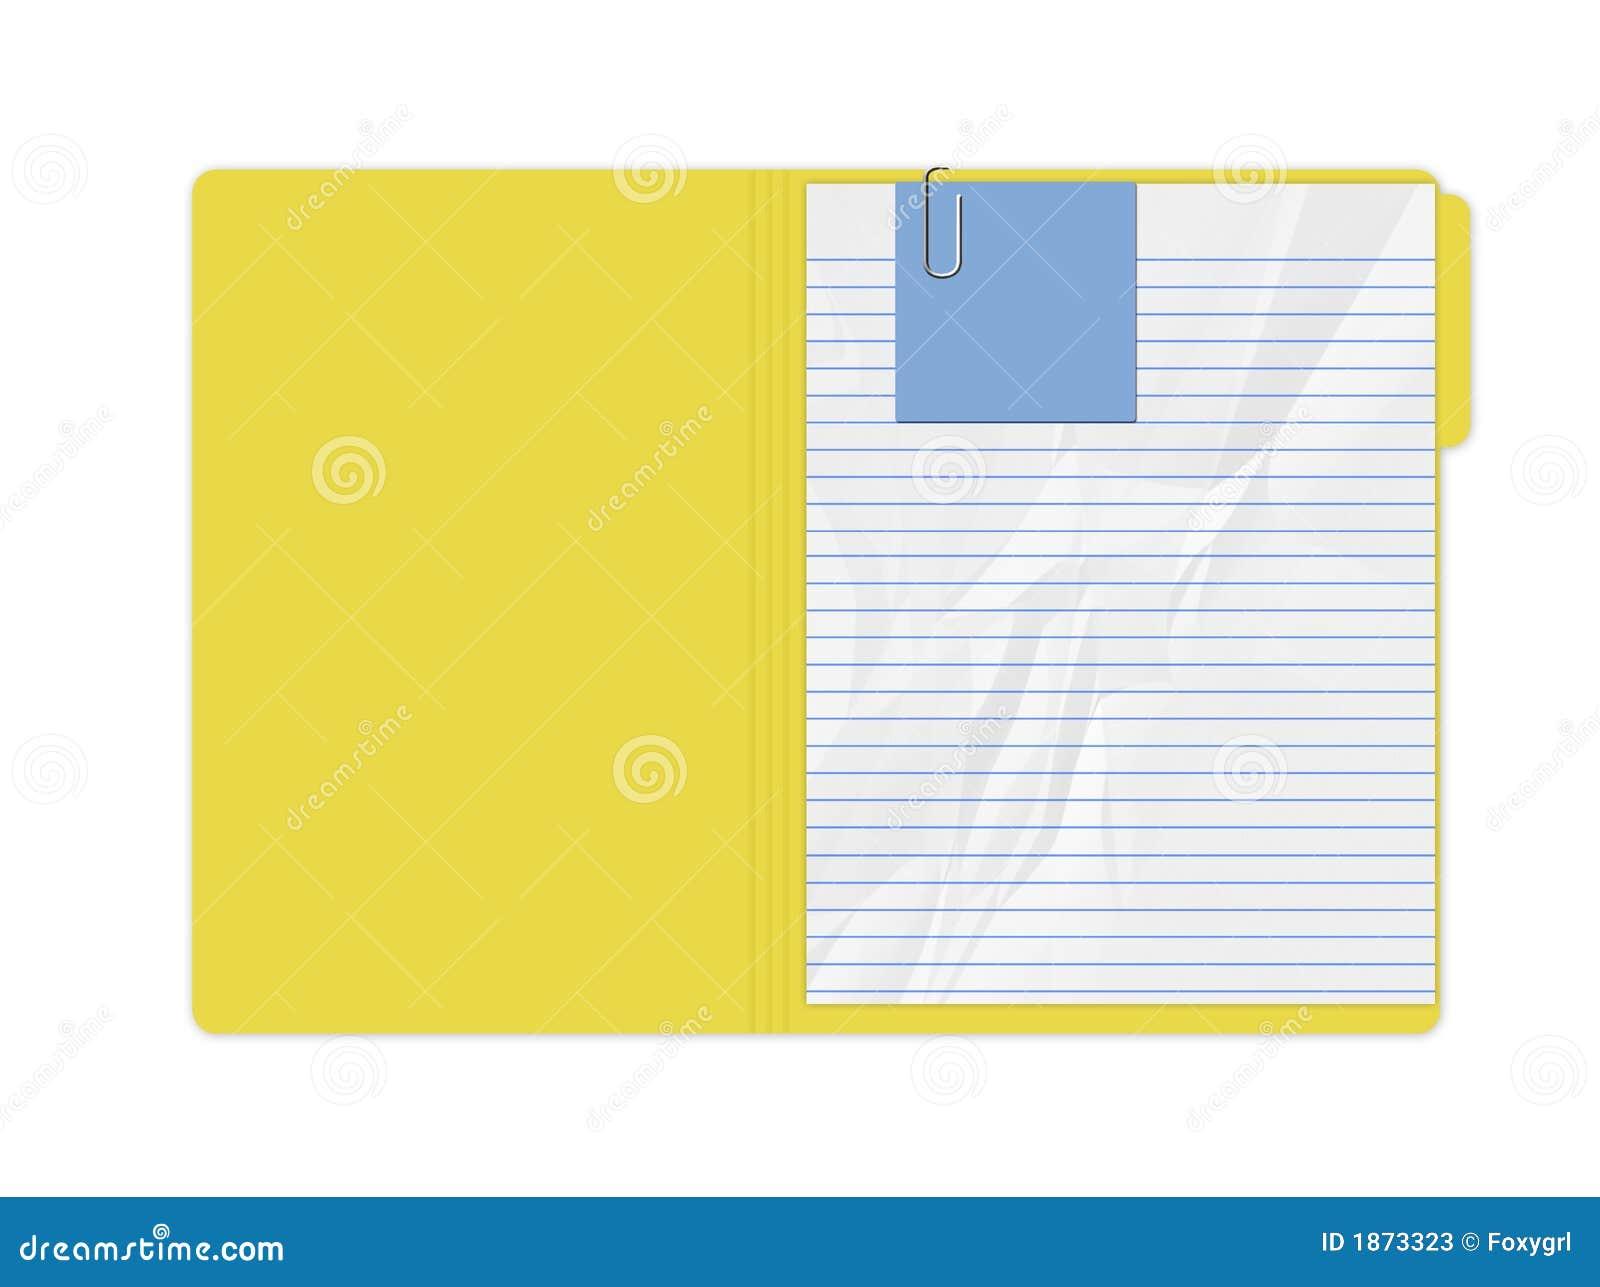 Yellow Folder Stock Photos - Image: 1873323